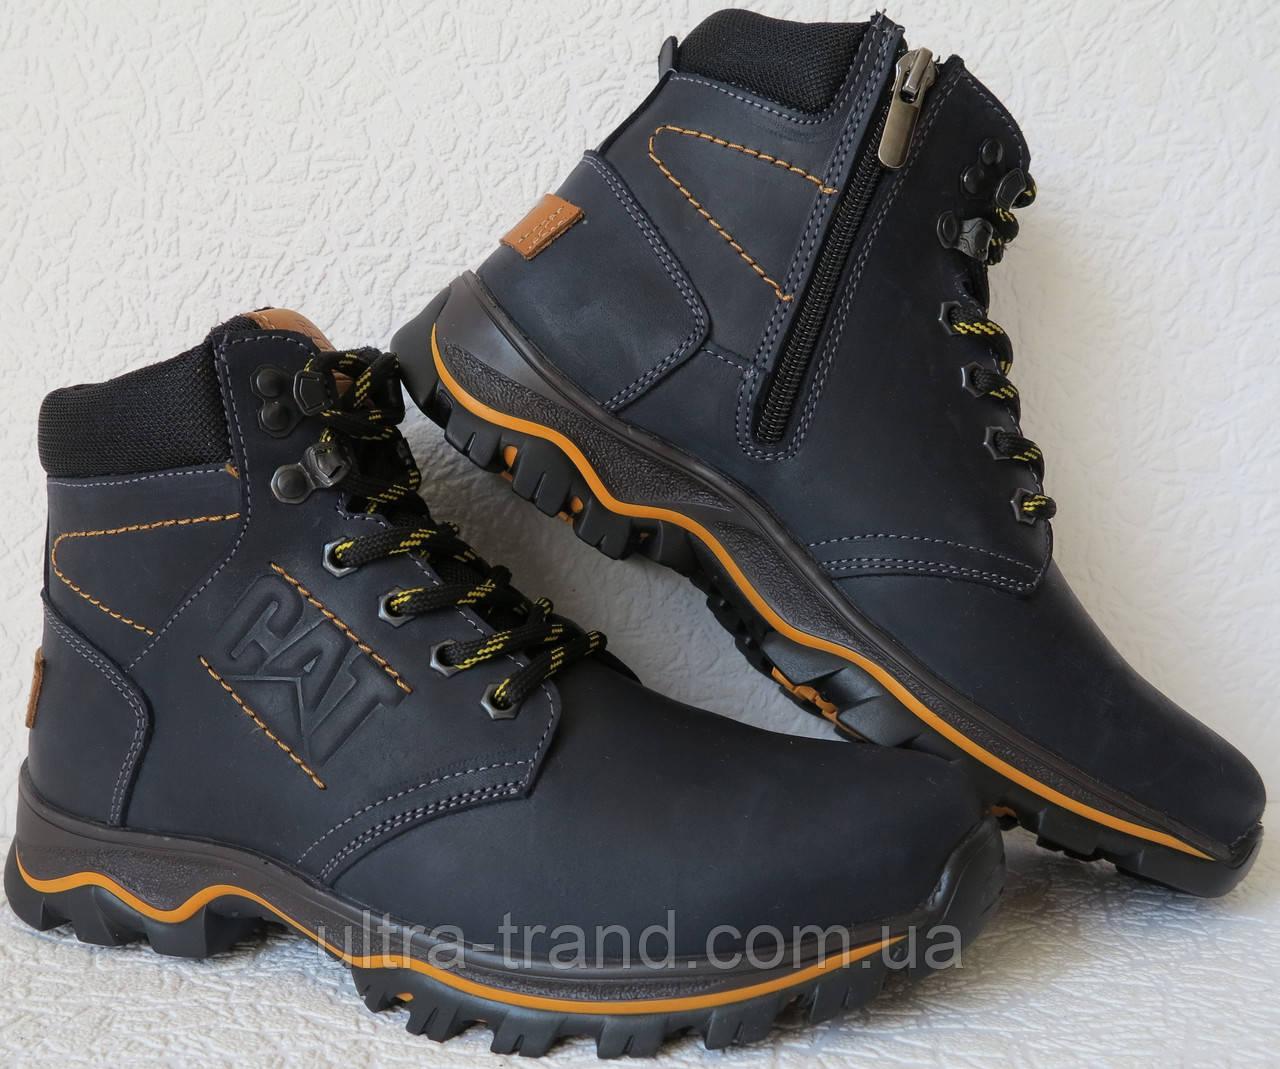 7d5e1cf3e Детские зимние в стиле Caterpillar сапоги кожа ботинки САТ мех теплые  качество синие - Интернет магазин